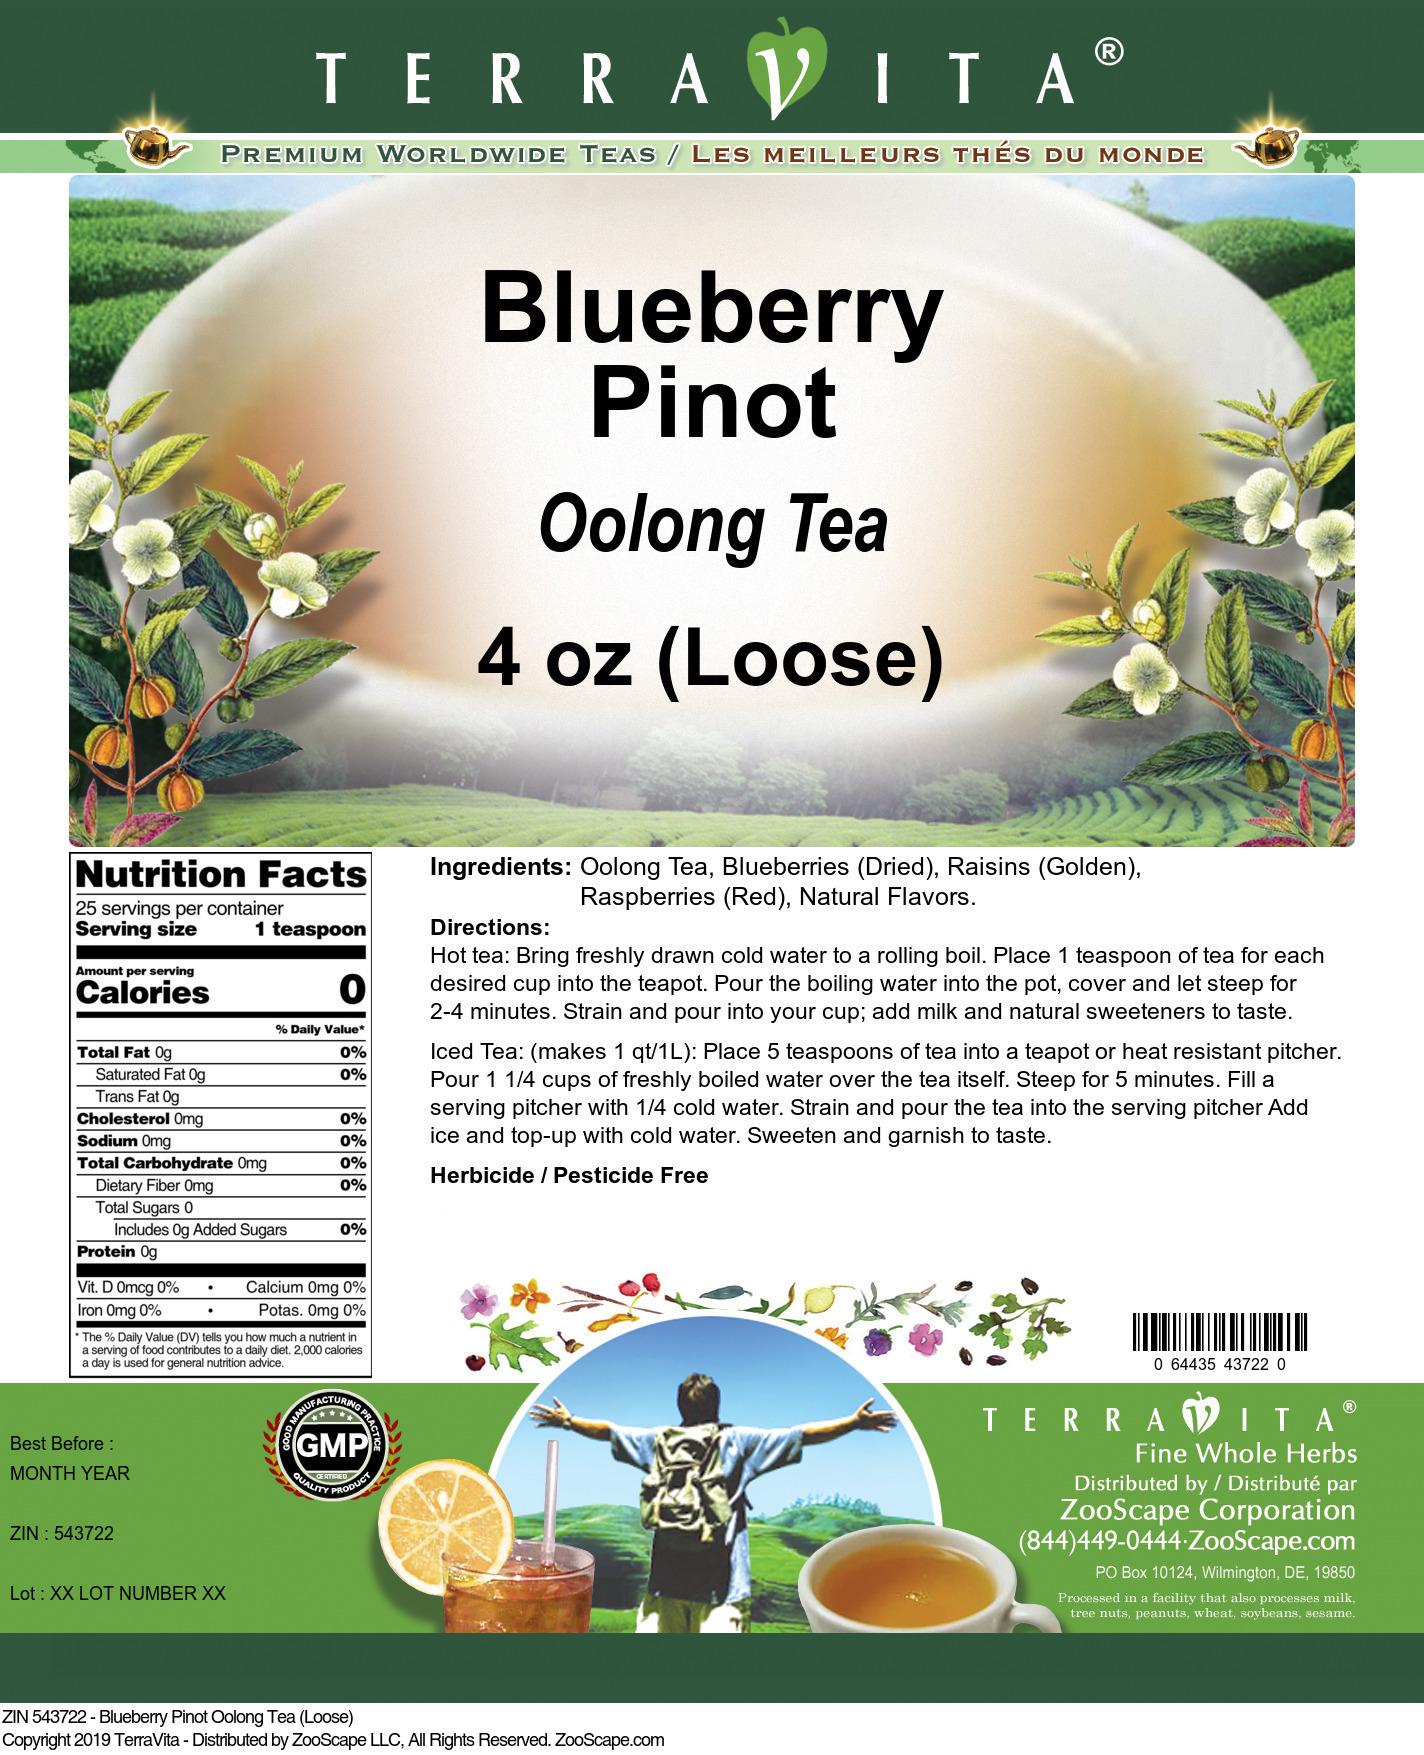 Blueberry Pinot Oolong Tea